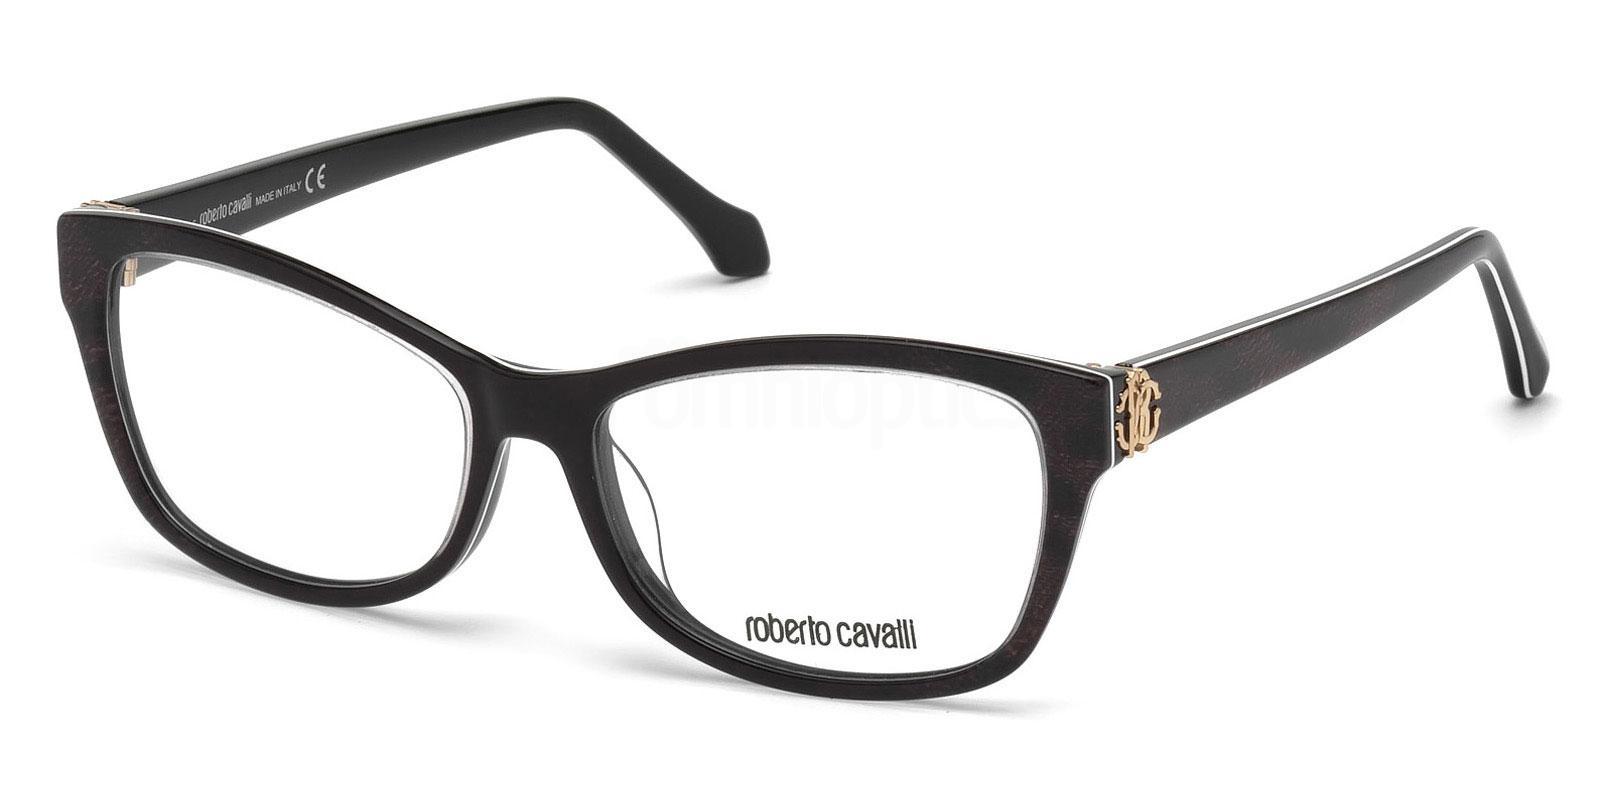 005 RC5013 Glasses, Roberto Cavalli